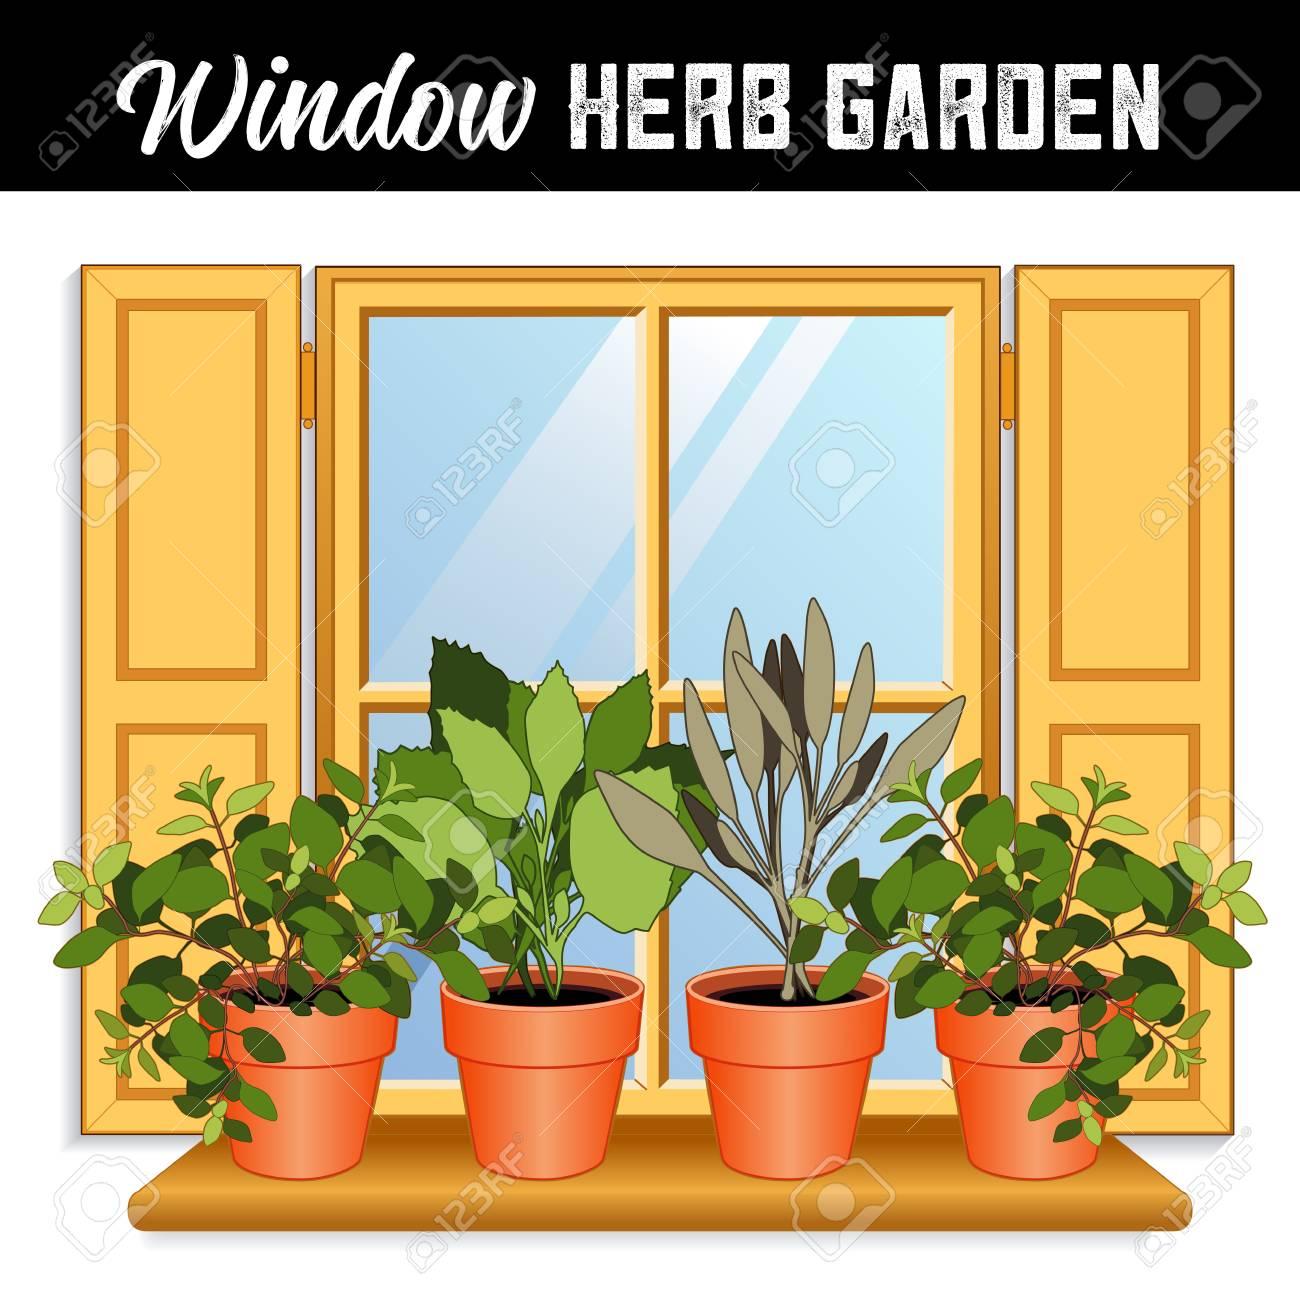 225 & Window Herb Garden with Italian Oregano Garden Sage Sweet Basil..